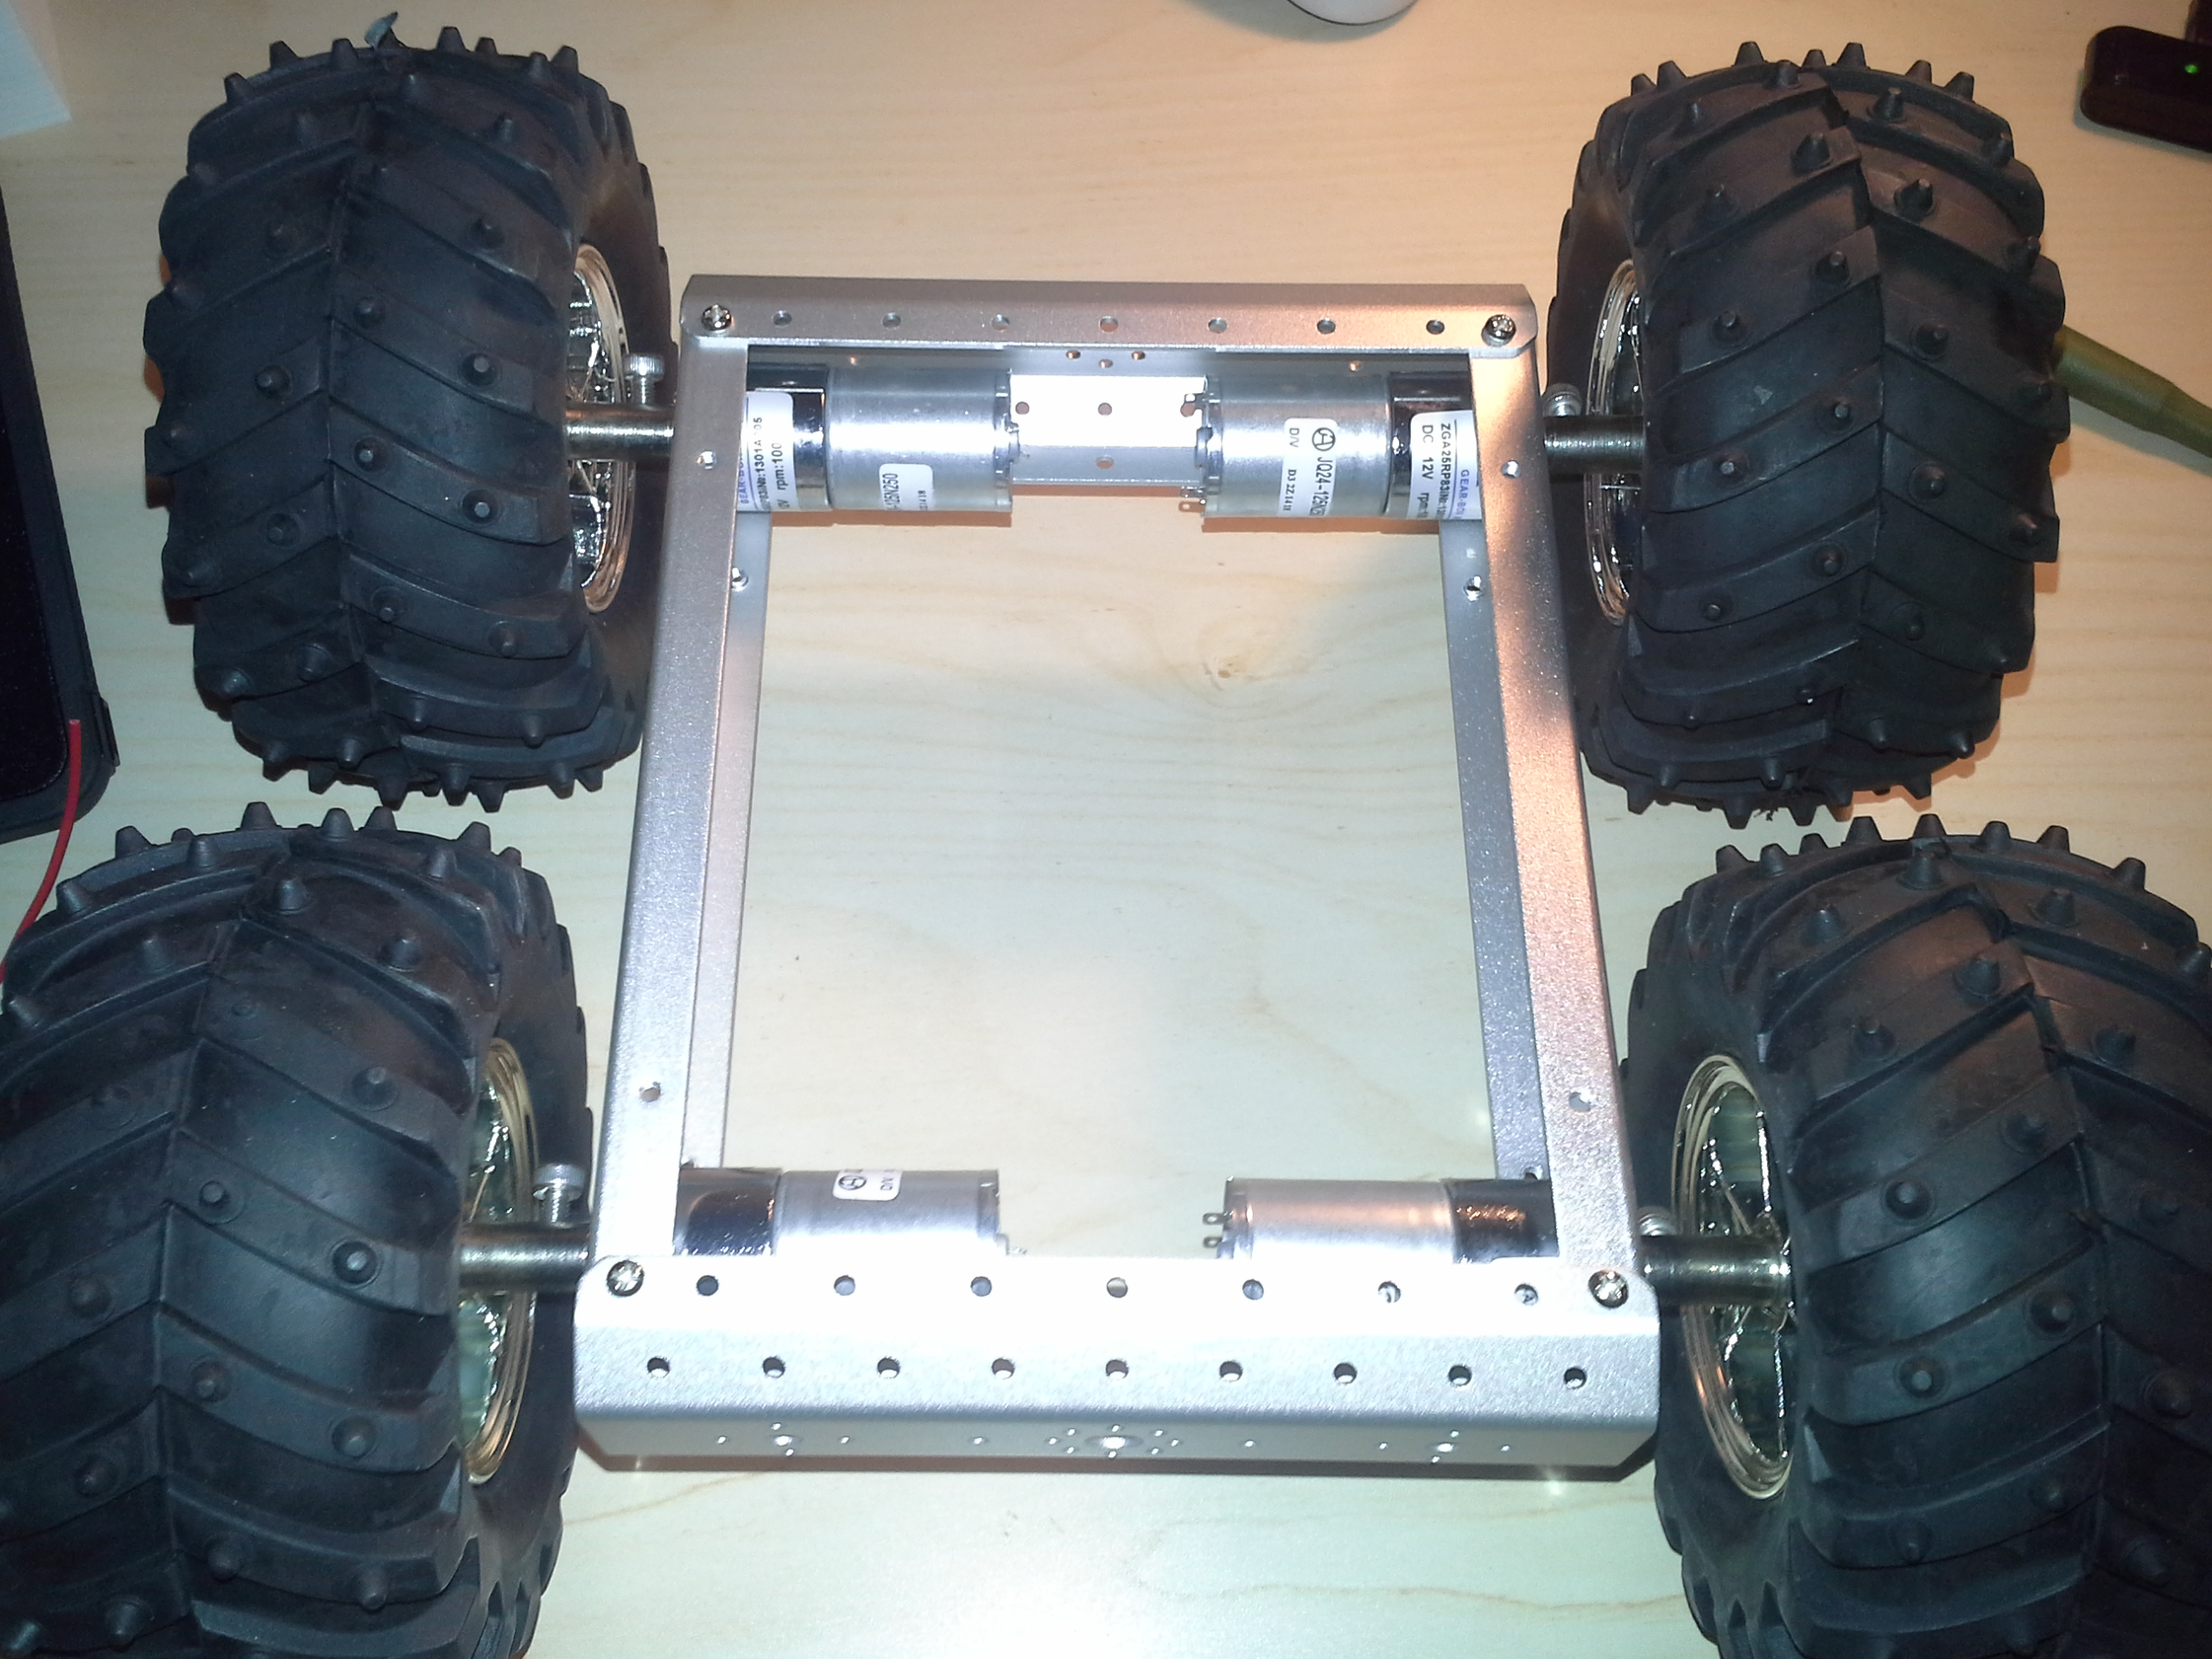 4WD Aluminium Mobile Robot Platform Bild 16: Fertig montierte Reifen